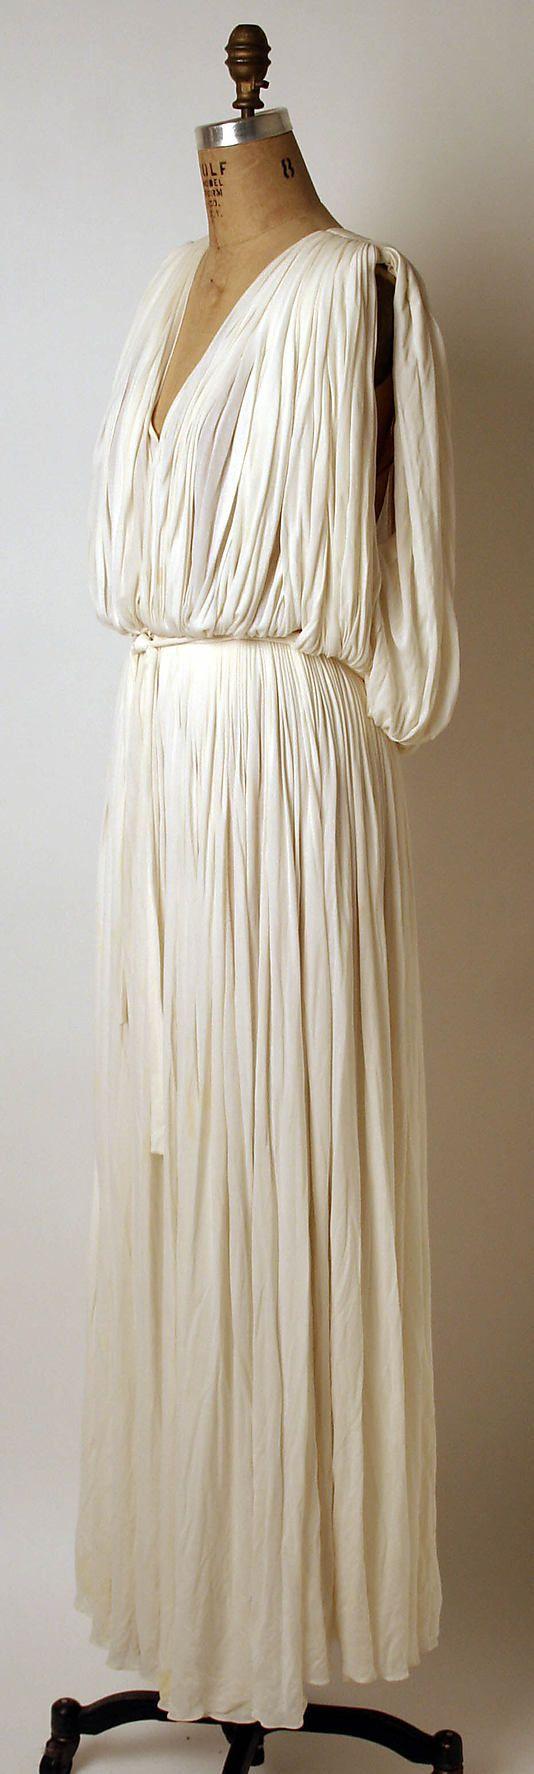 Evening dress Madame Grès (Alix Barton) (French, Paris 1903–1993 Var region) Date: ca. 1965 Culture: French Medium: silk